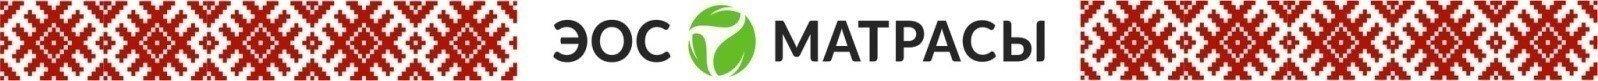 Матрасы ЭОС, топперы - фото pic_47692b95e1c279e5cfa80972dcd3e437_1920x9000_1.jpg